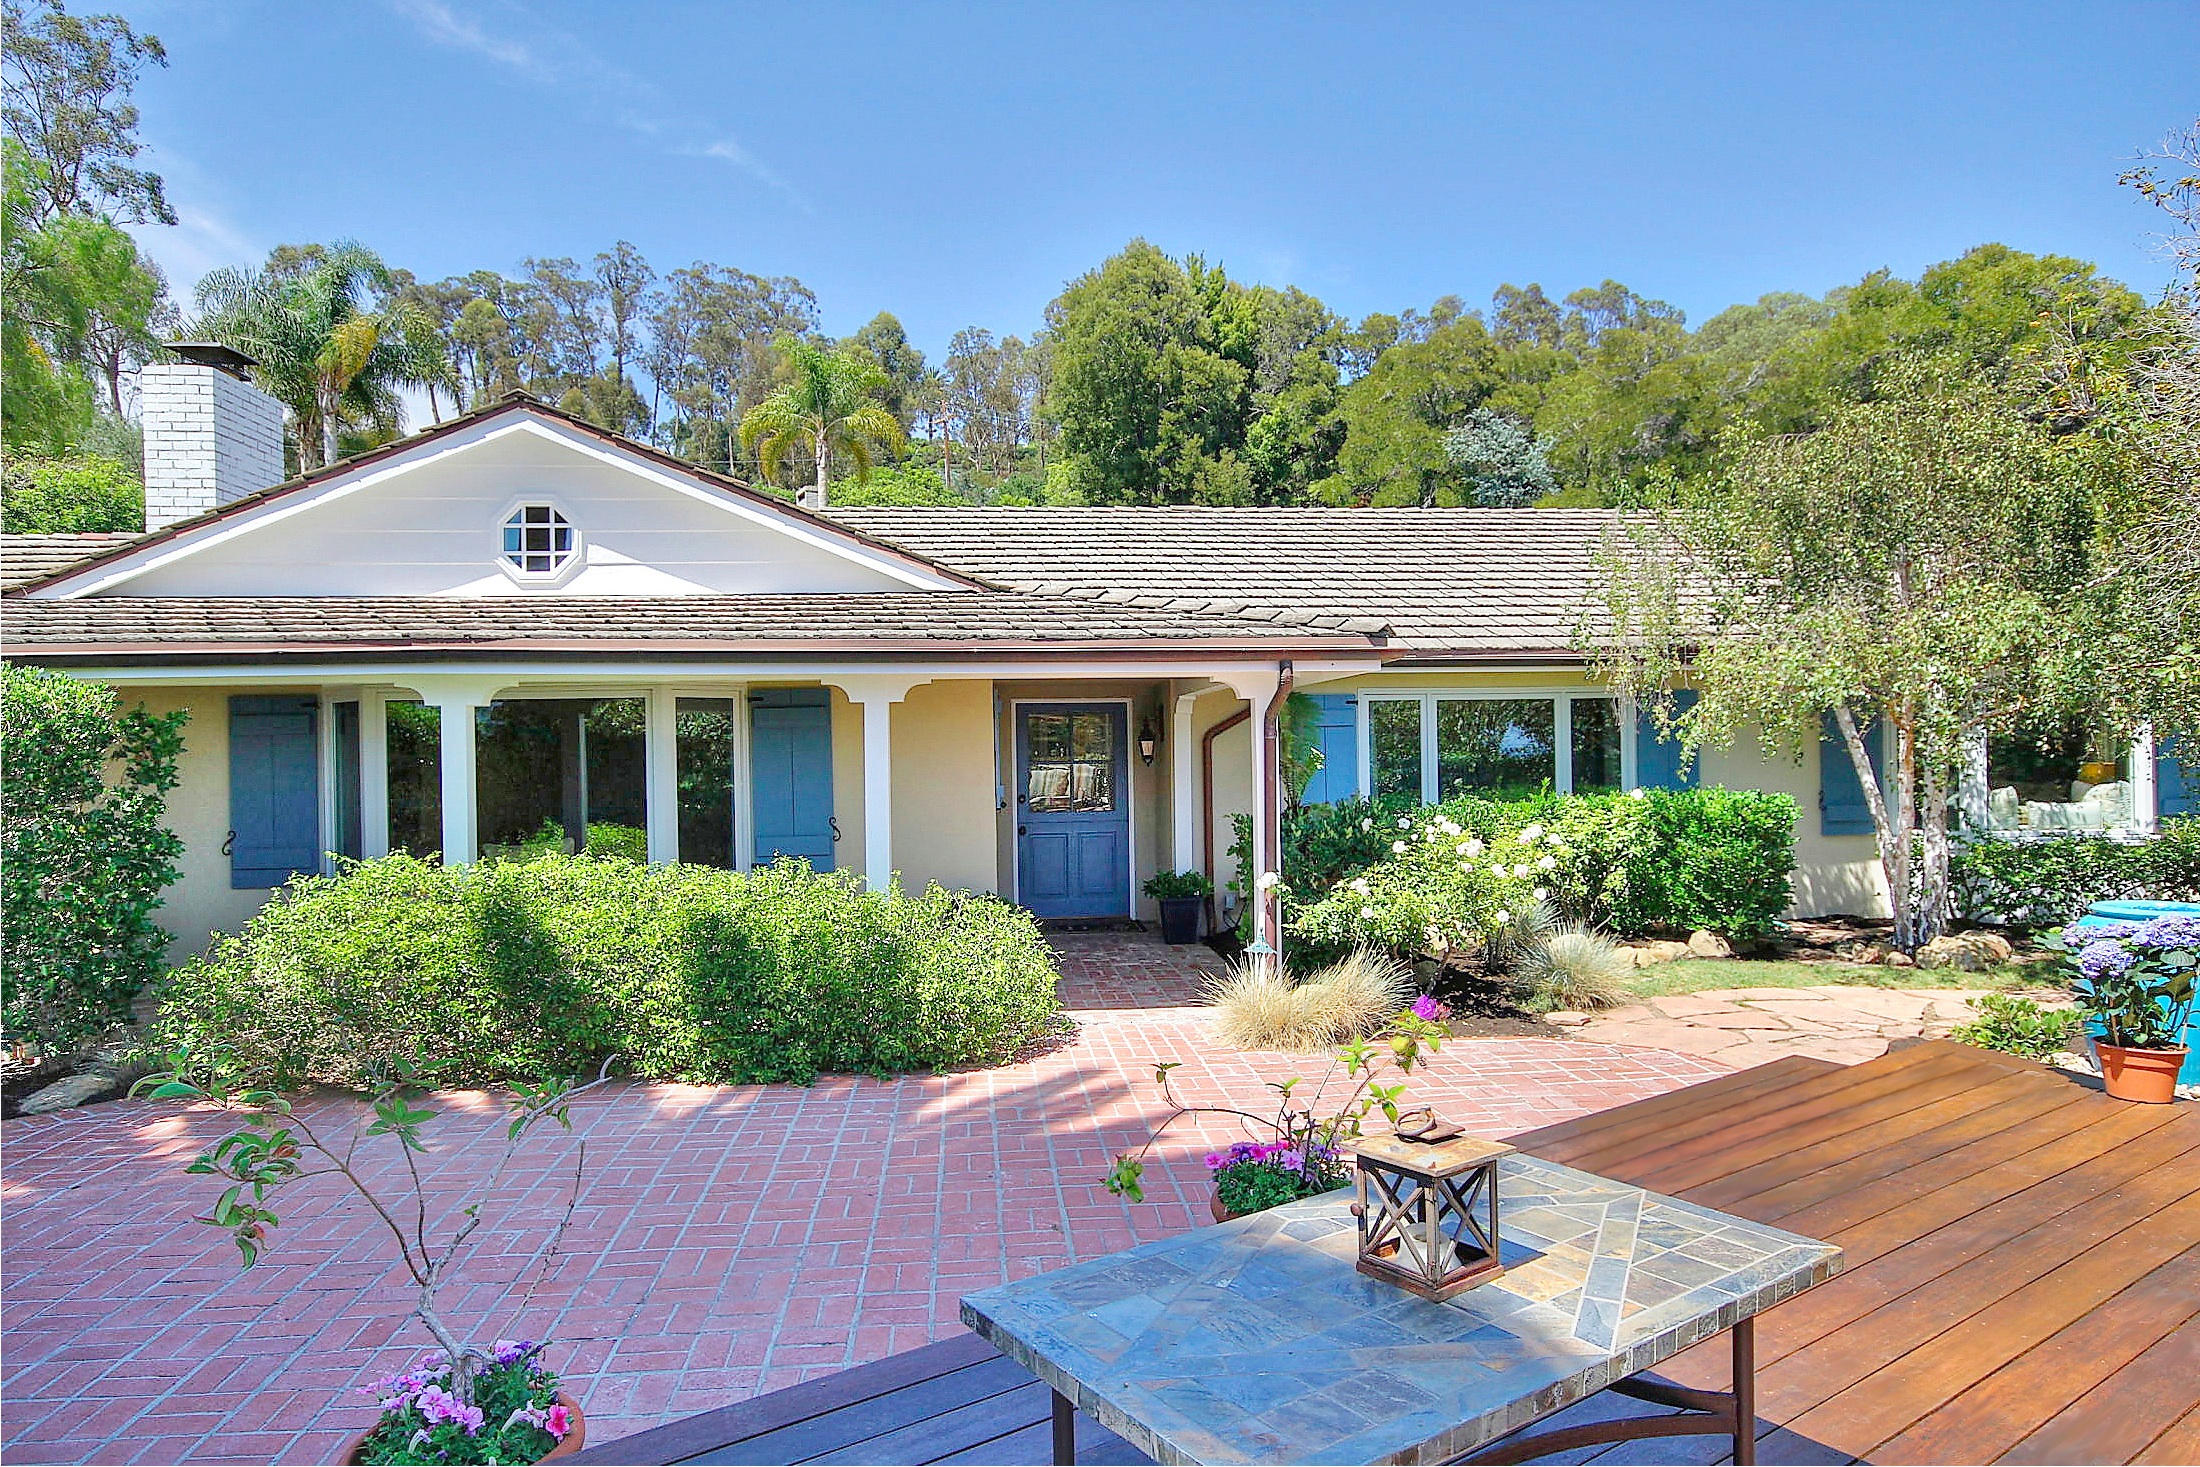 Property photo for 830 Norman Ln Santa Barbara, California 93108 - 14-2313